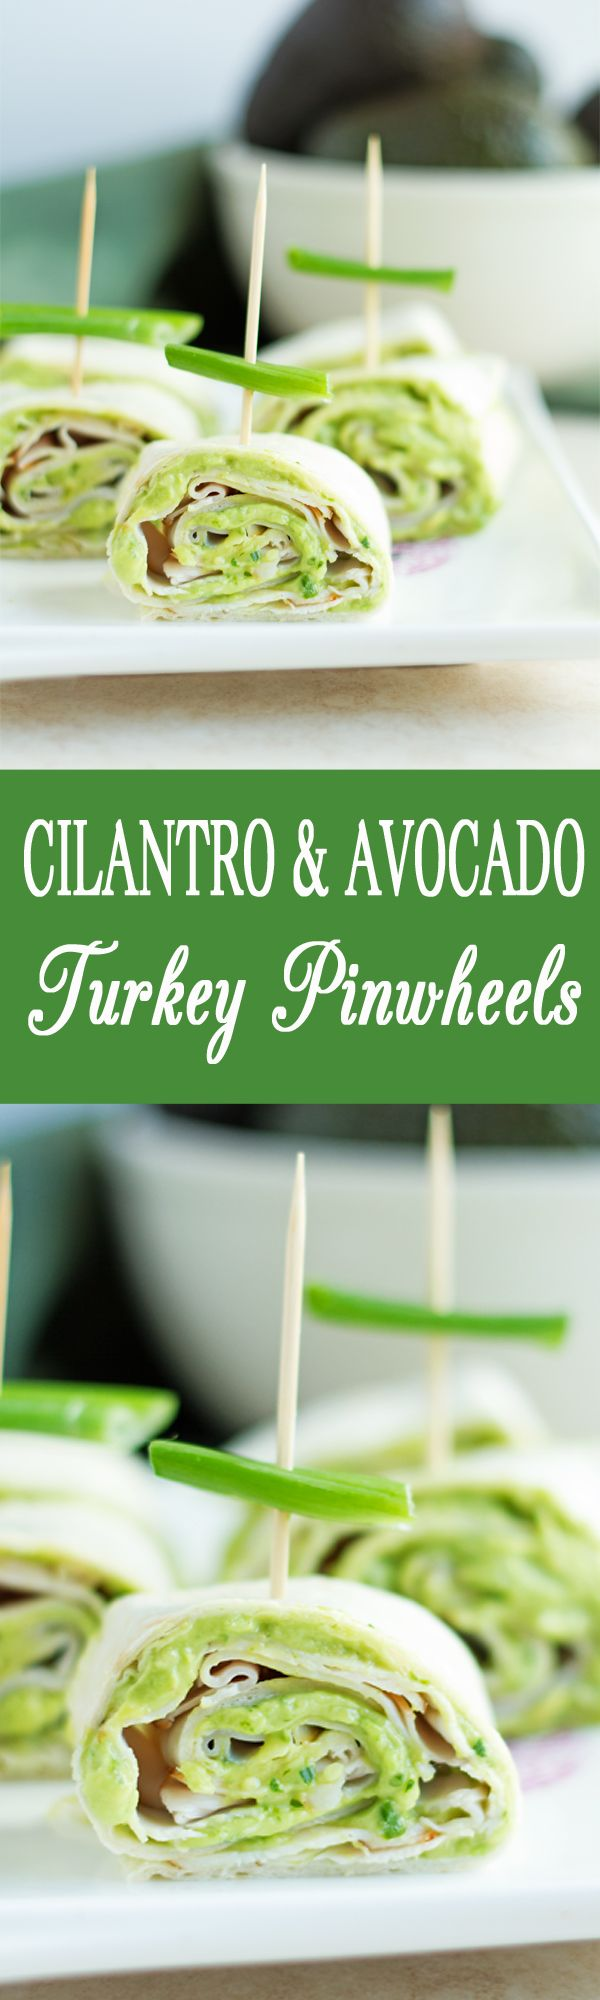 Cilantro & Avocado Turkey Pinwheels - Perfect party food idea: turkey pinwheels with delicious avocado, fresh chive and cilantro sauce. Easy to make and your guests will love it! by ilonaspassion.com I @ilonaspassion